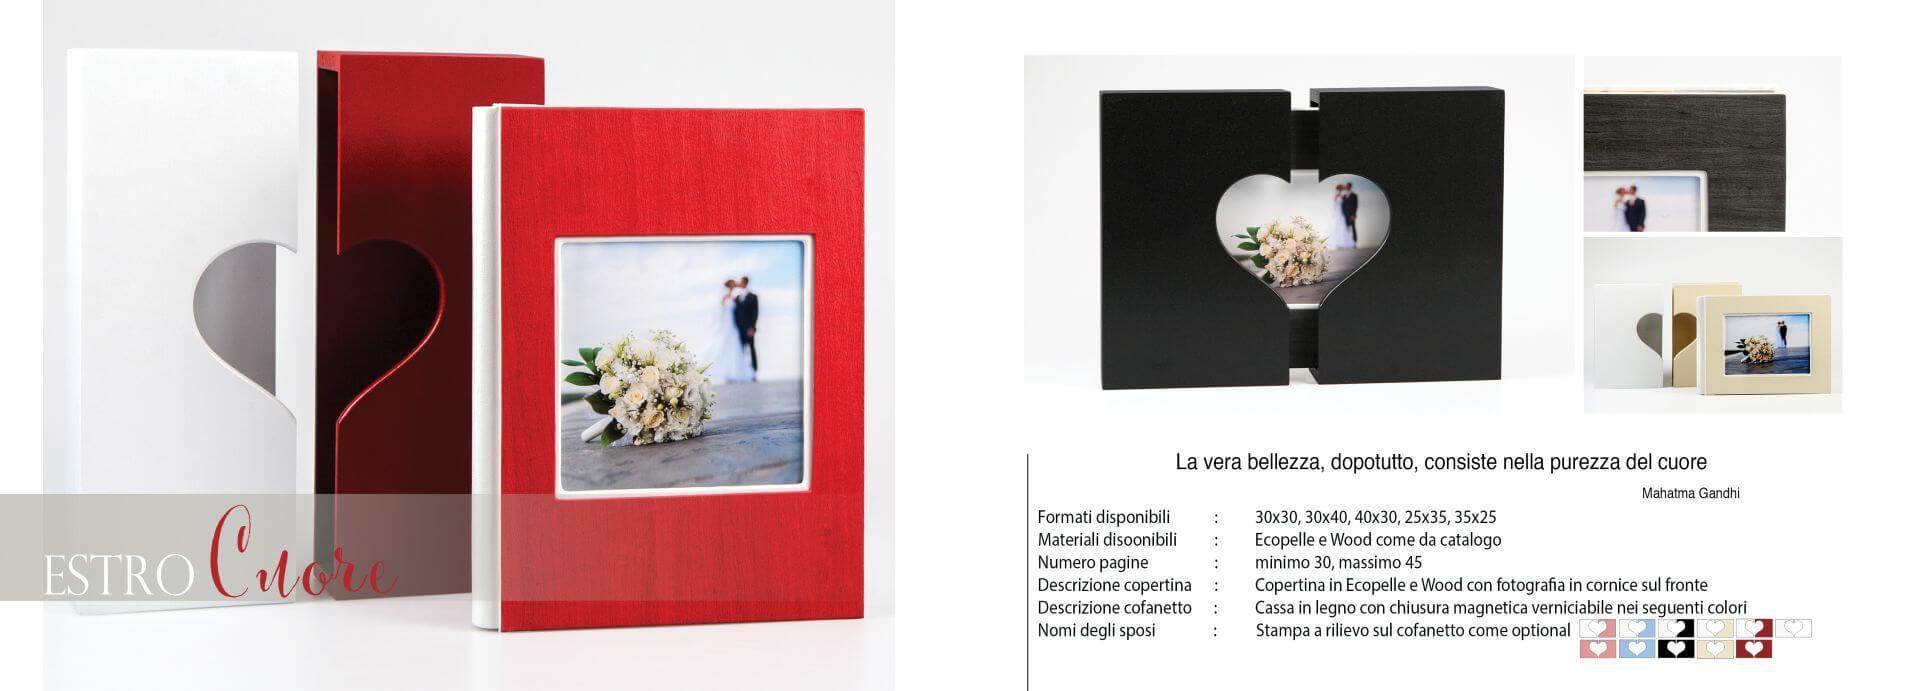 slide-new-2019-cuore